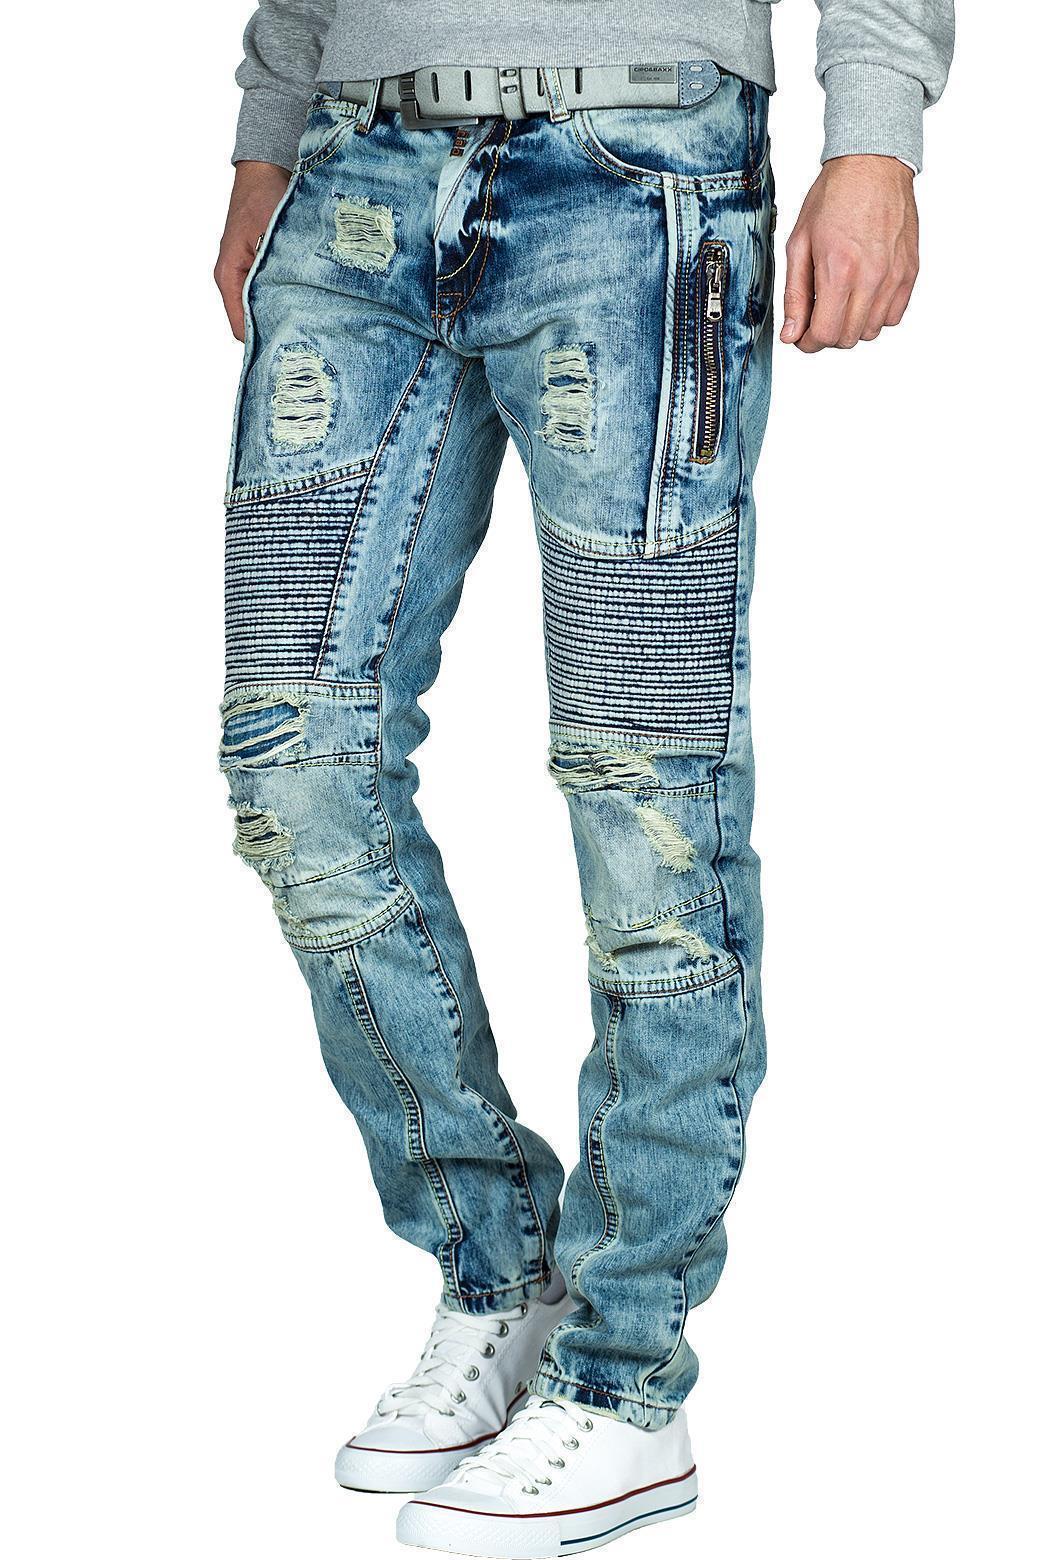 Cipo-amp-Baxx-Uomo-Jeans-Pantaloni-ricamate-Biker-Style-streetwear-nervature-pattern-Dope miniatura 41